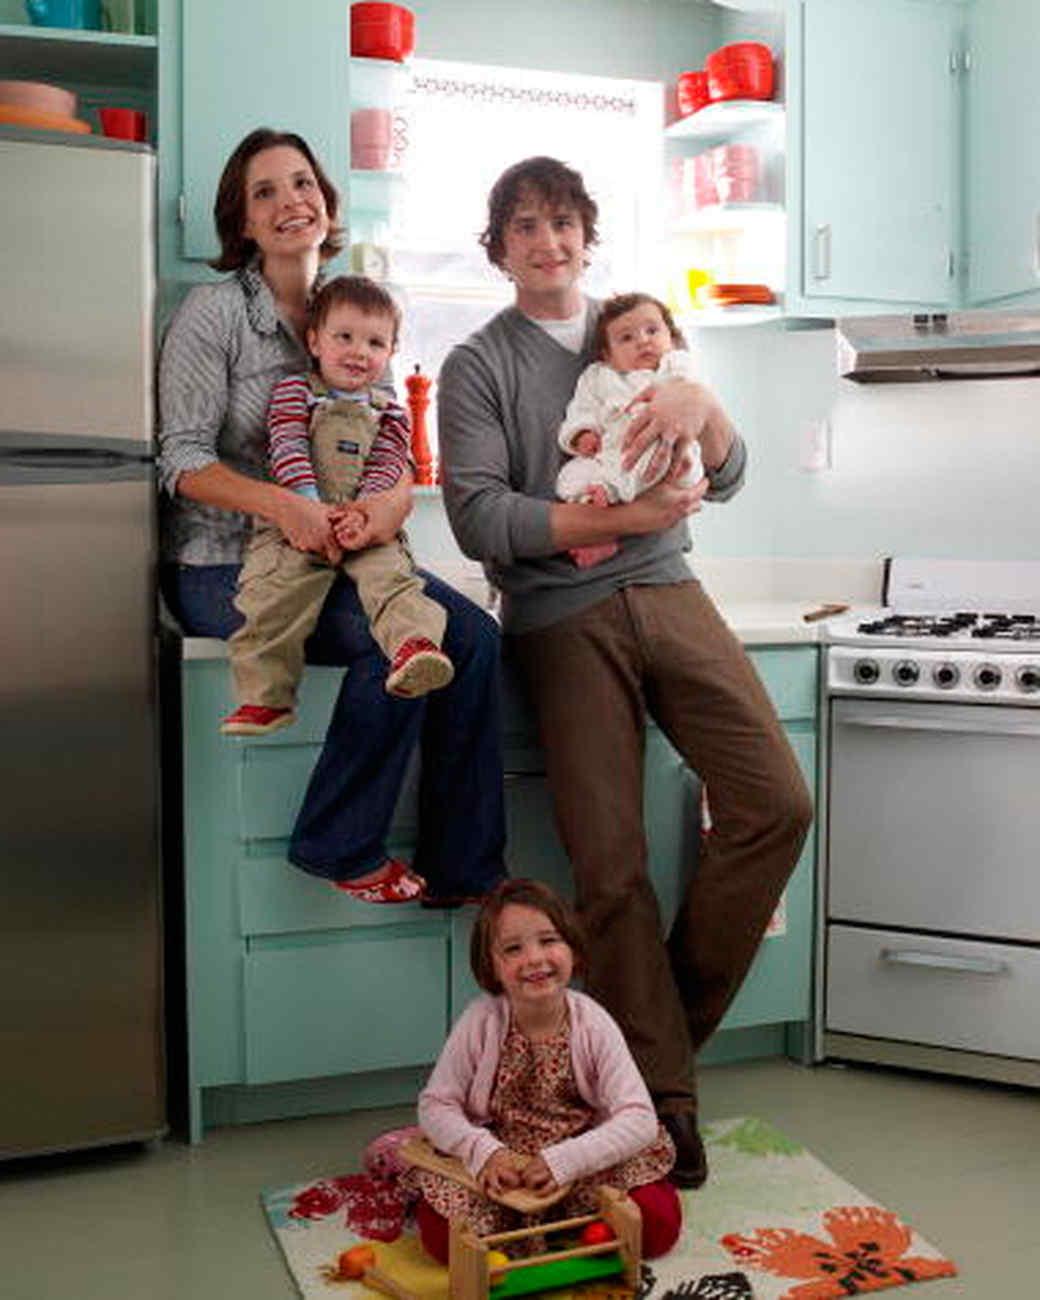 kitchenaid-family-d103556-0515.jpg